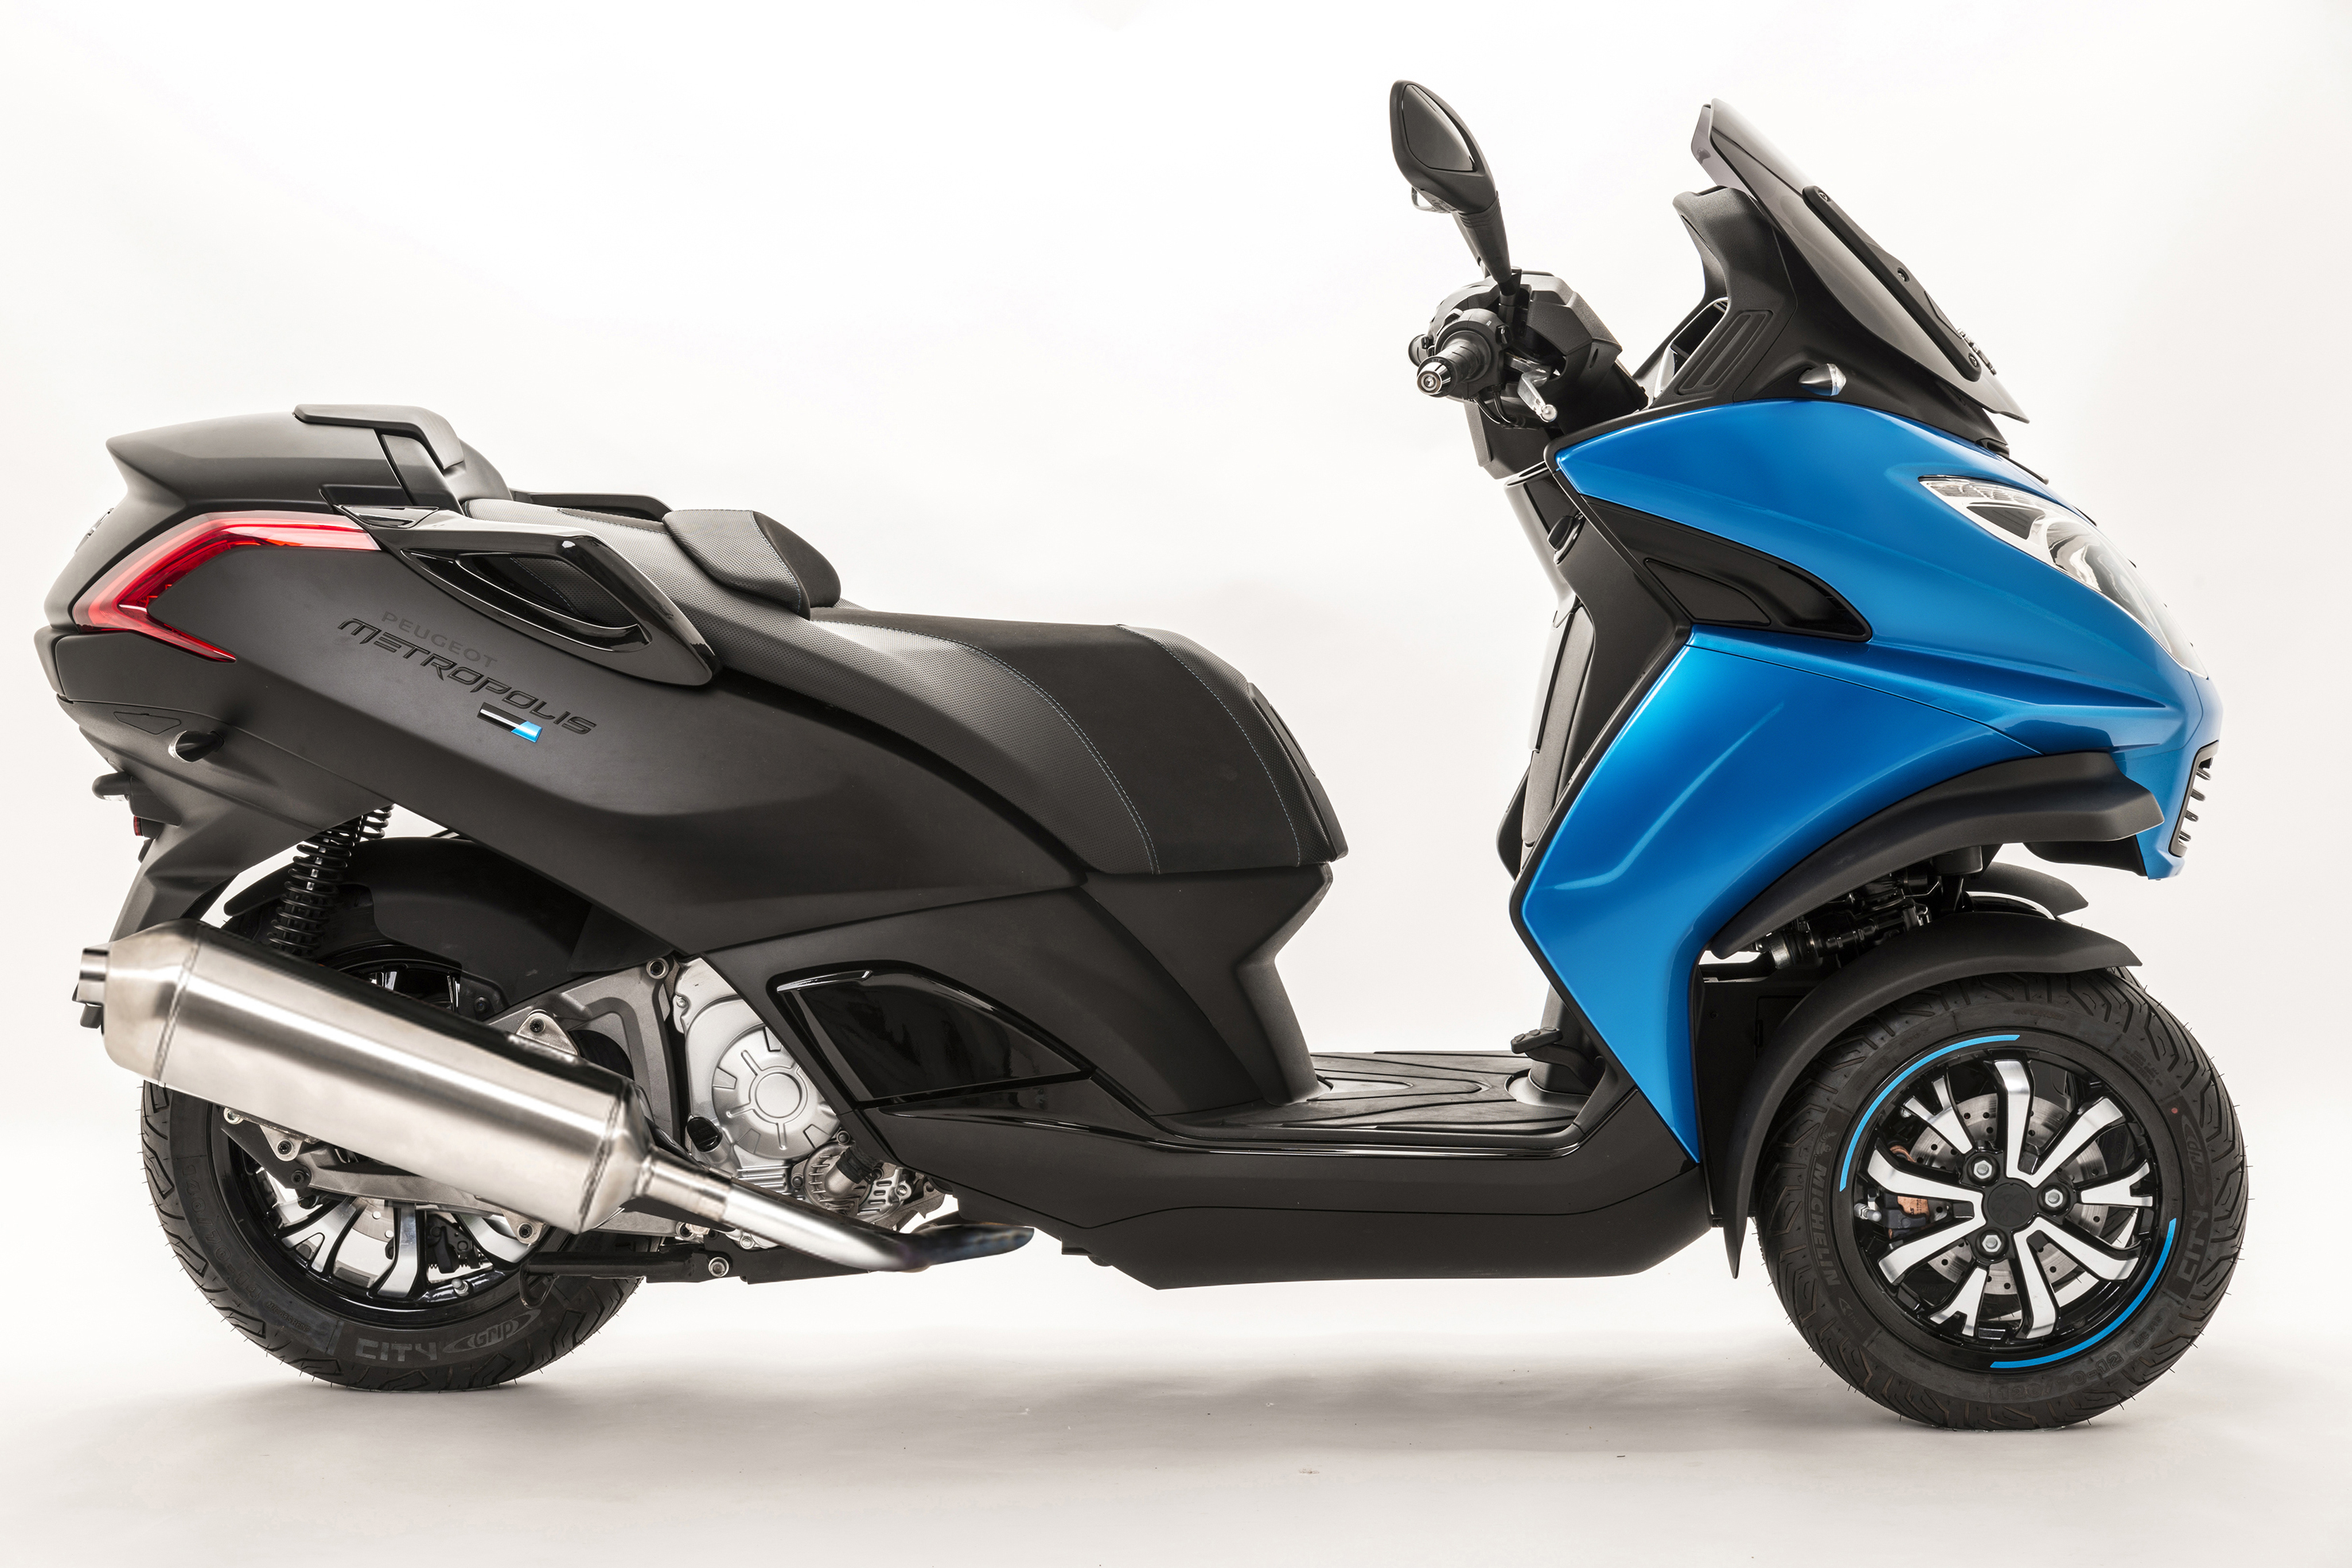 New special edition Peugeot Metropolis Blue-Line